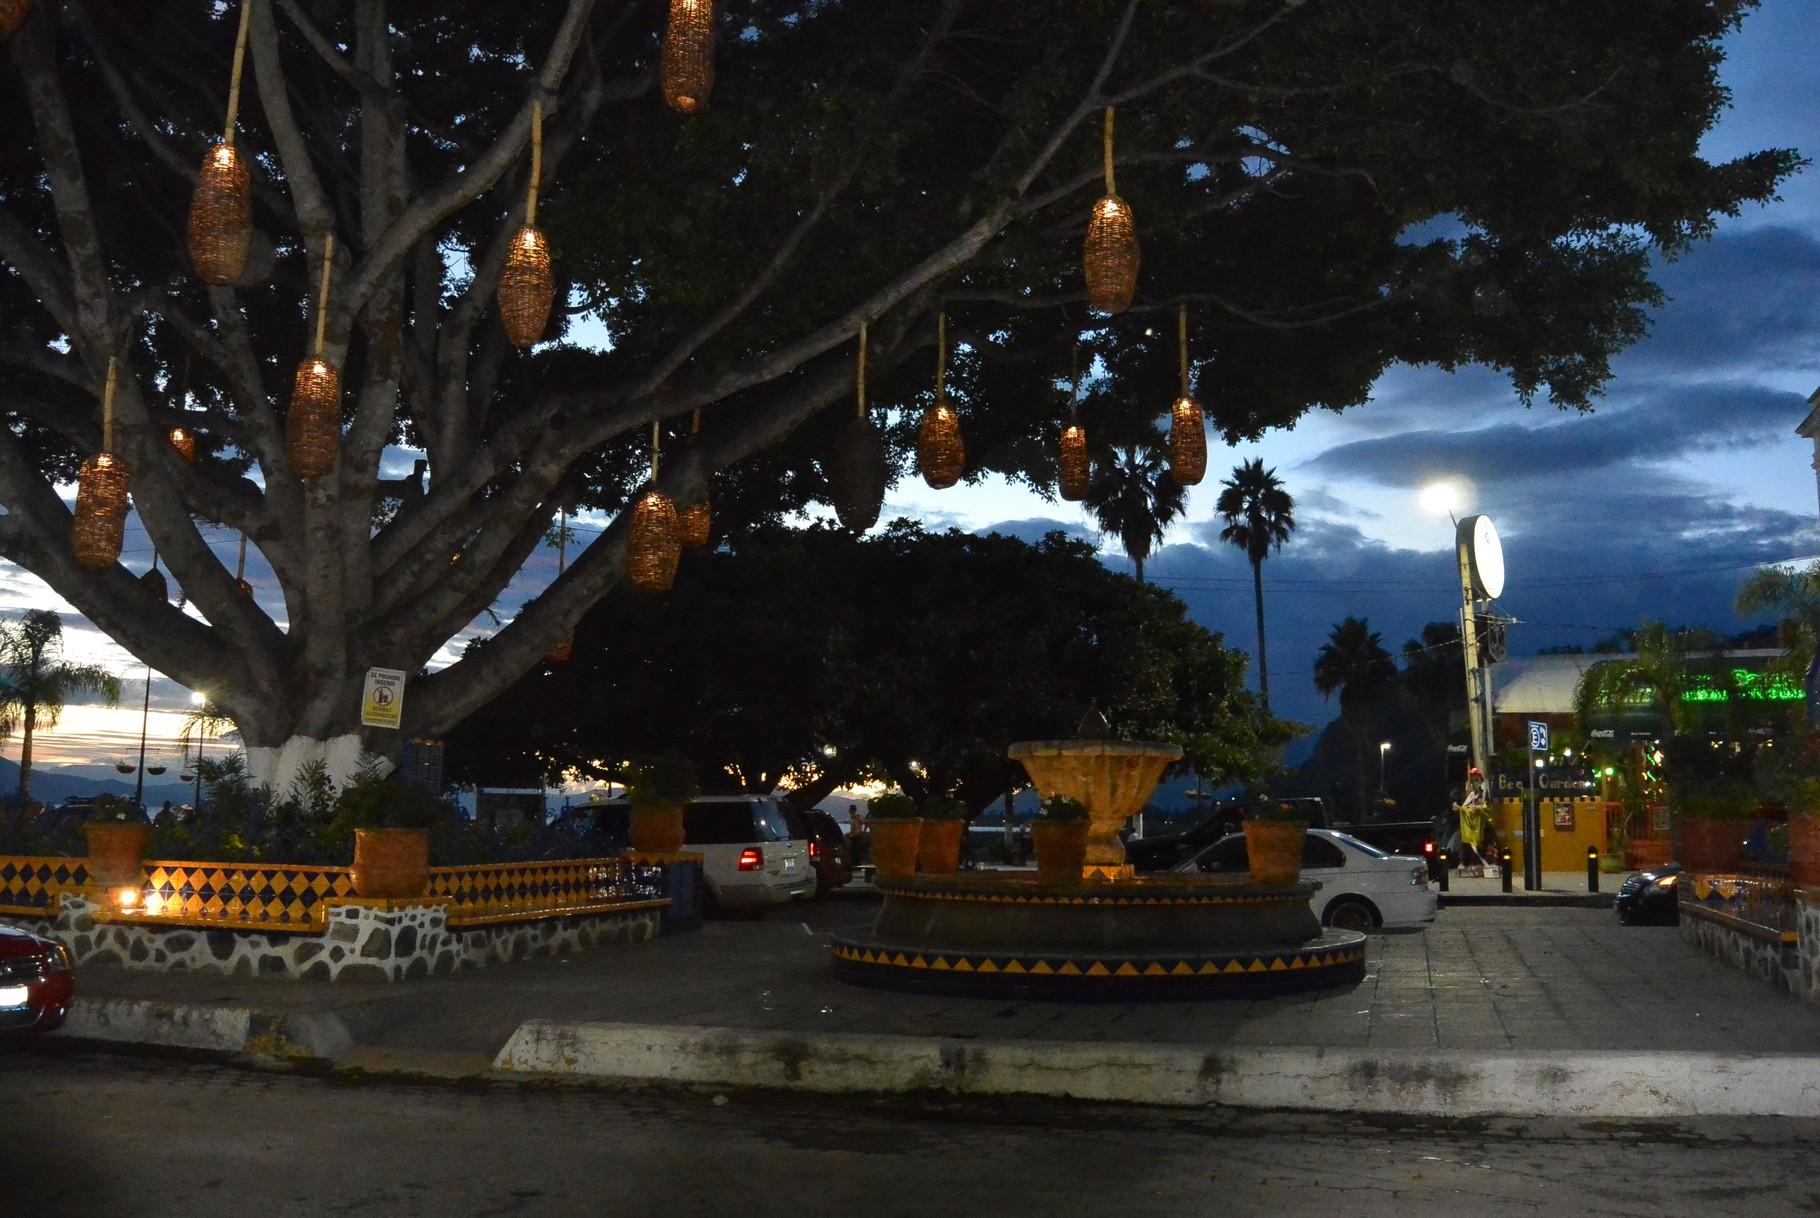 Eclairage original des arbres